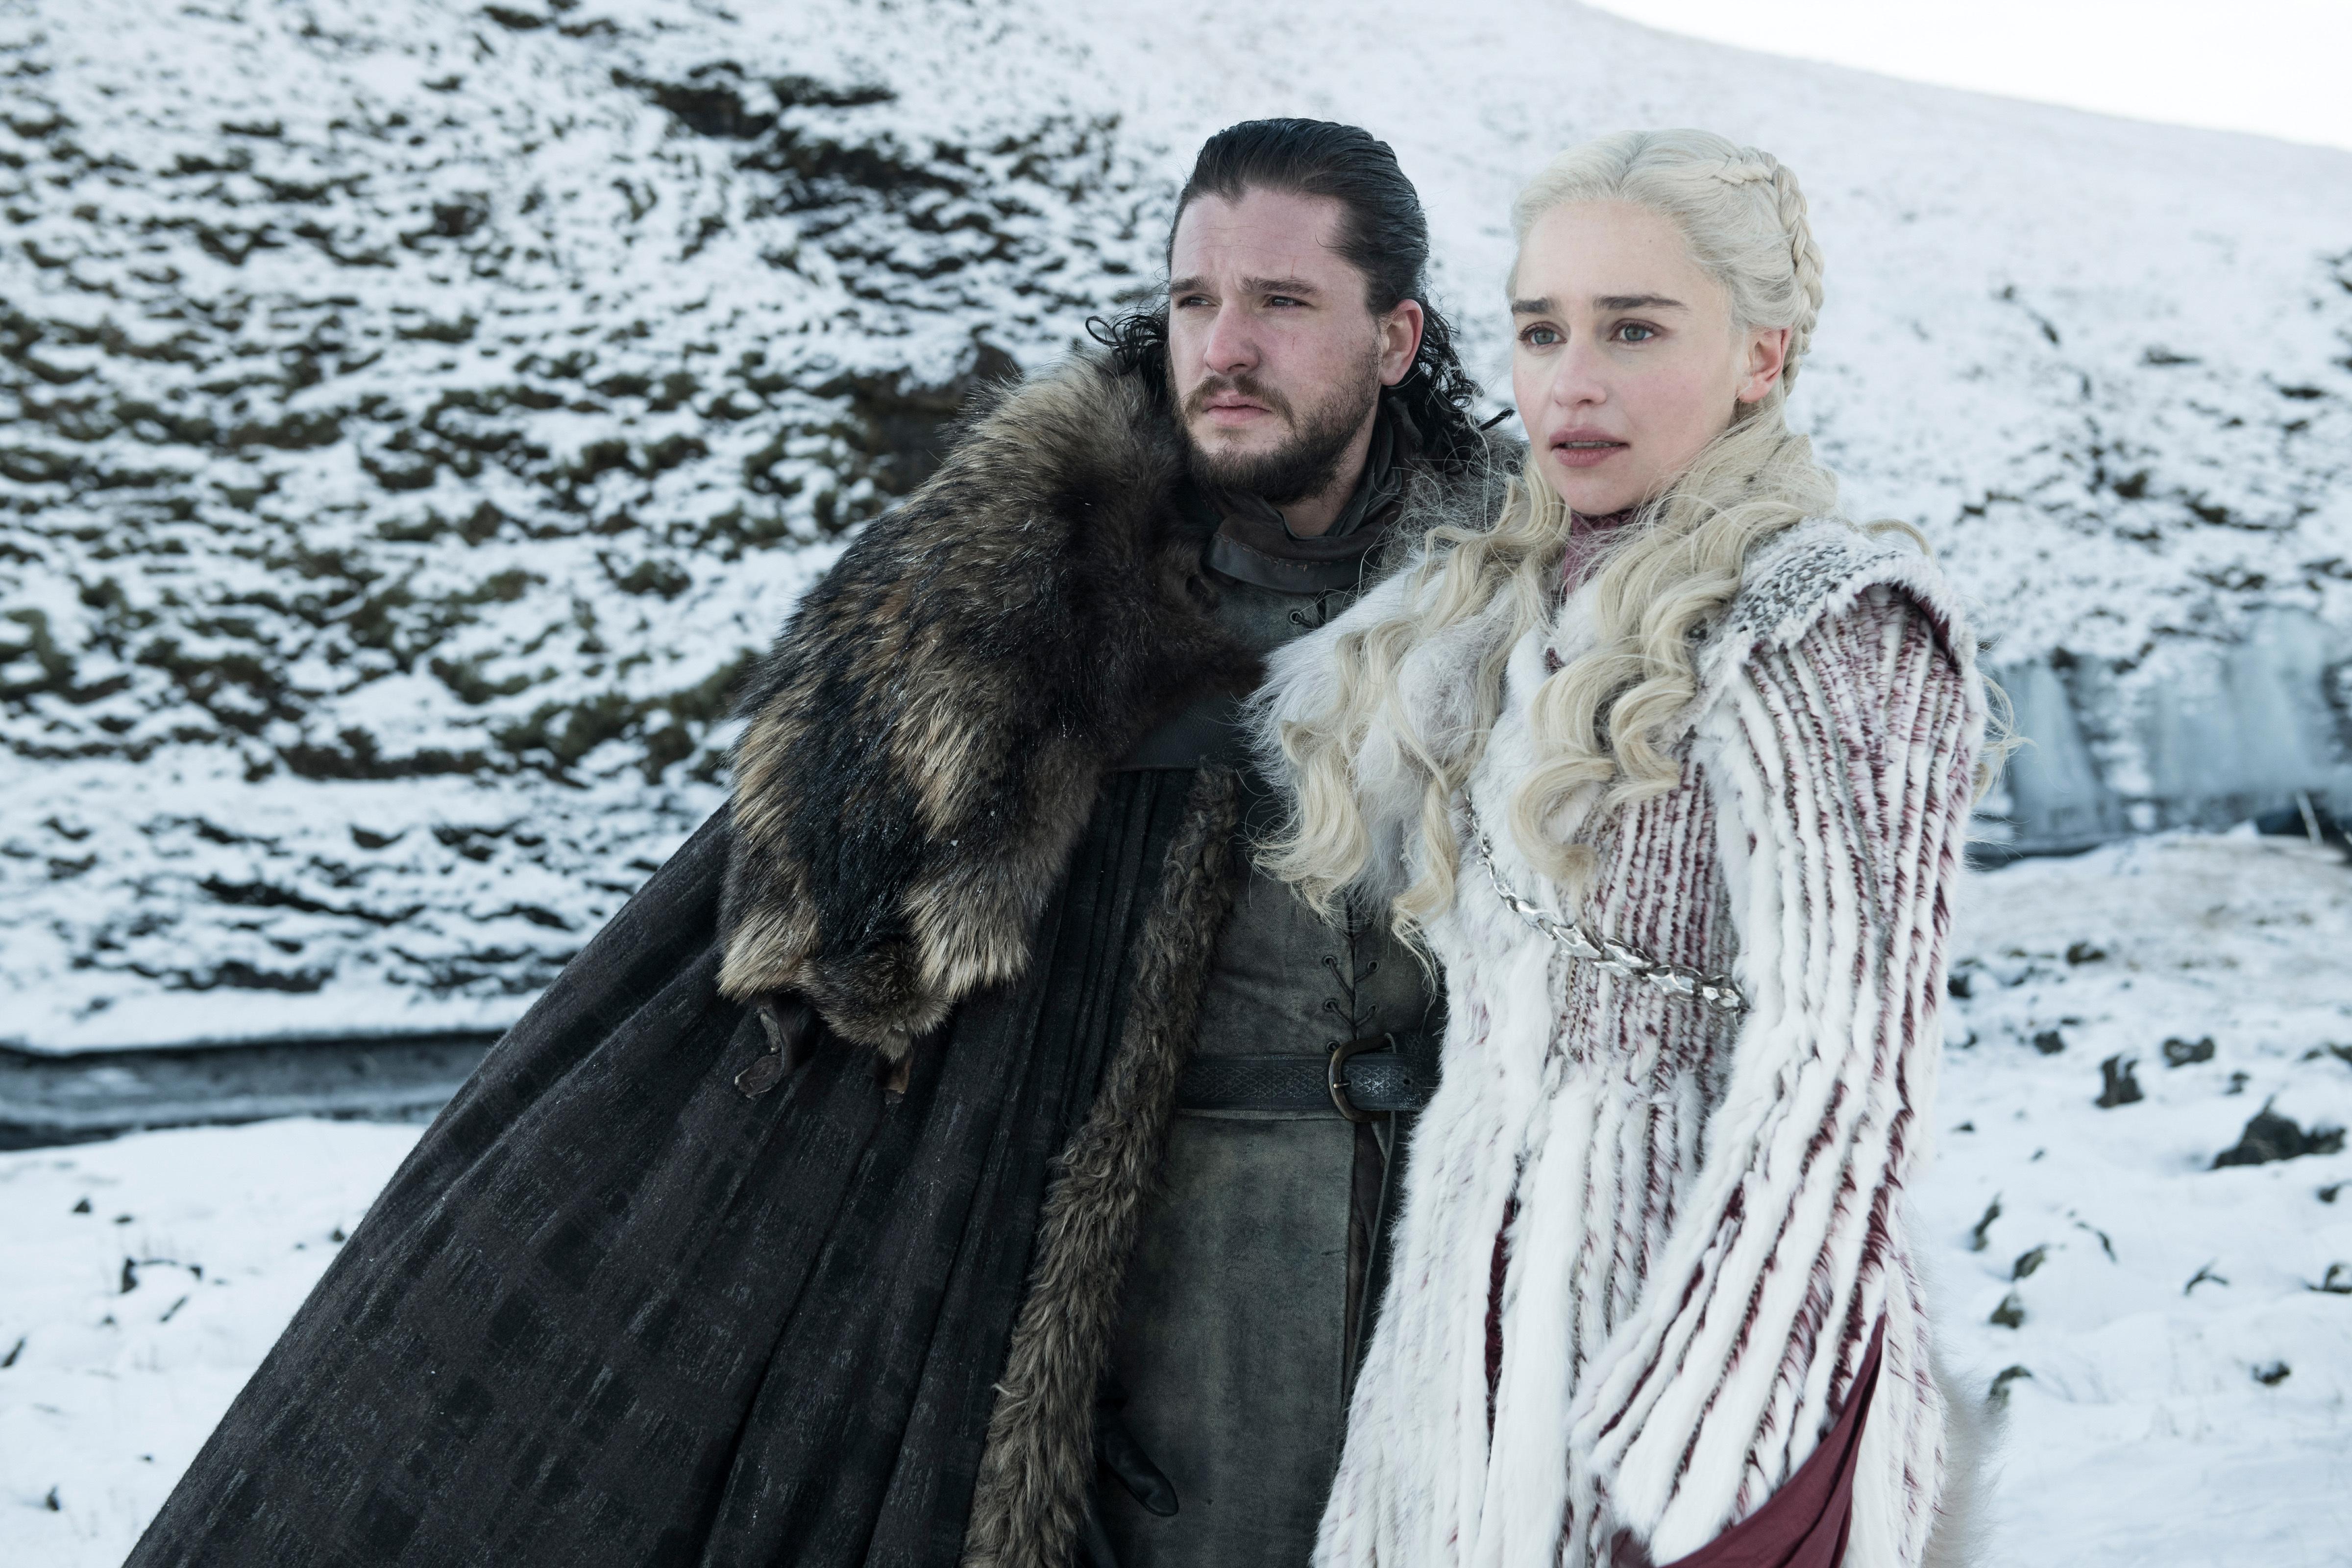 5f87a7ba8e3d2 Kit Harington, left, as Jon Snow and Emilia Clarke as Daenerys Targaryen in  Season